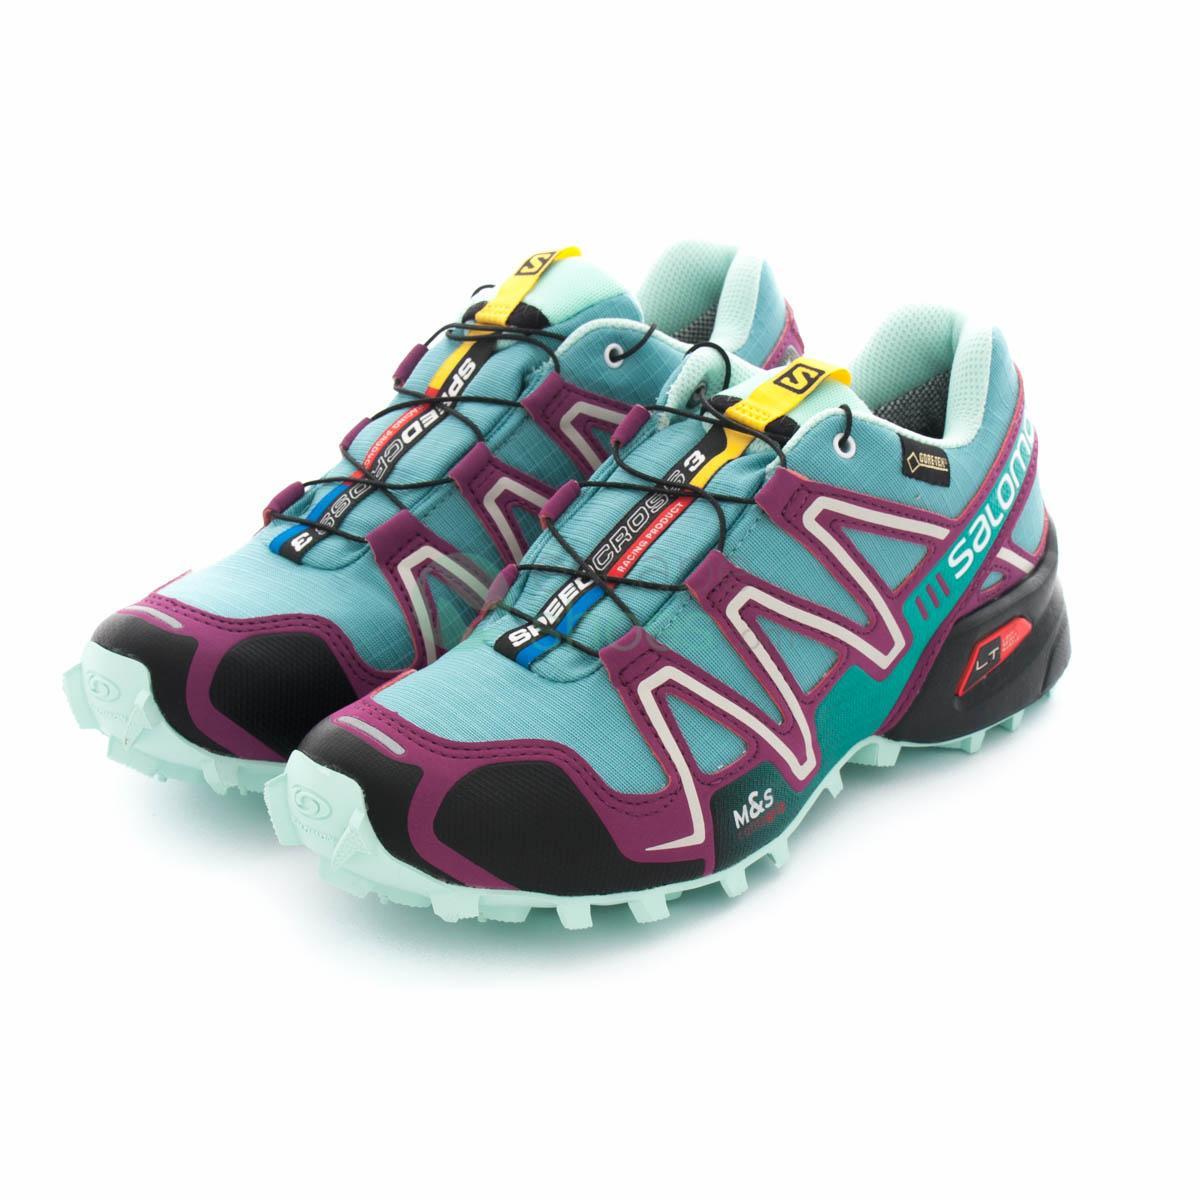 nouveau style 0f876 cba0d Sneakers SALOMON Speedcross 3 Gore-Tex Opaline Blue 376083